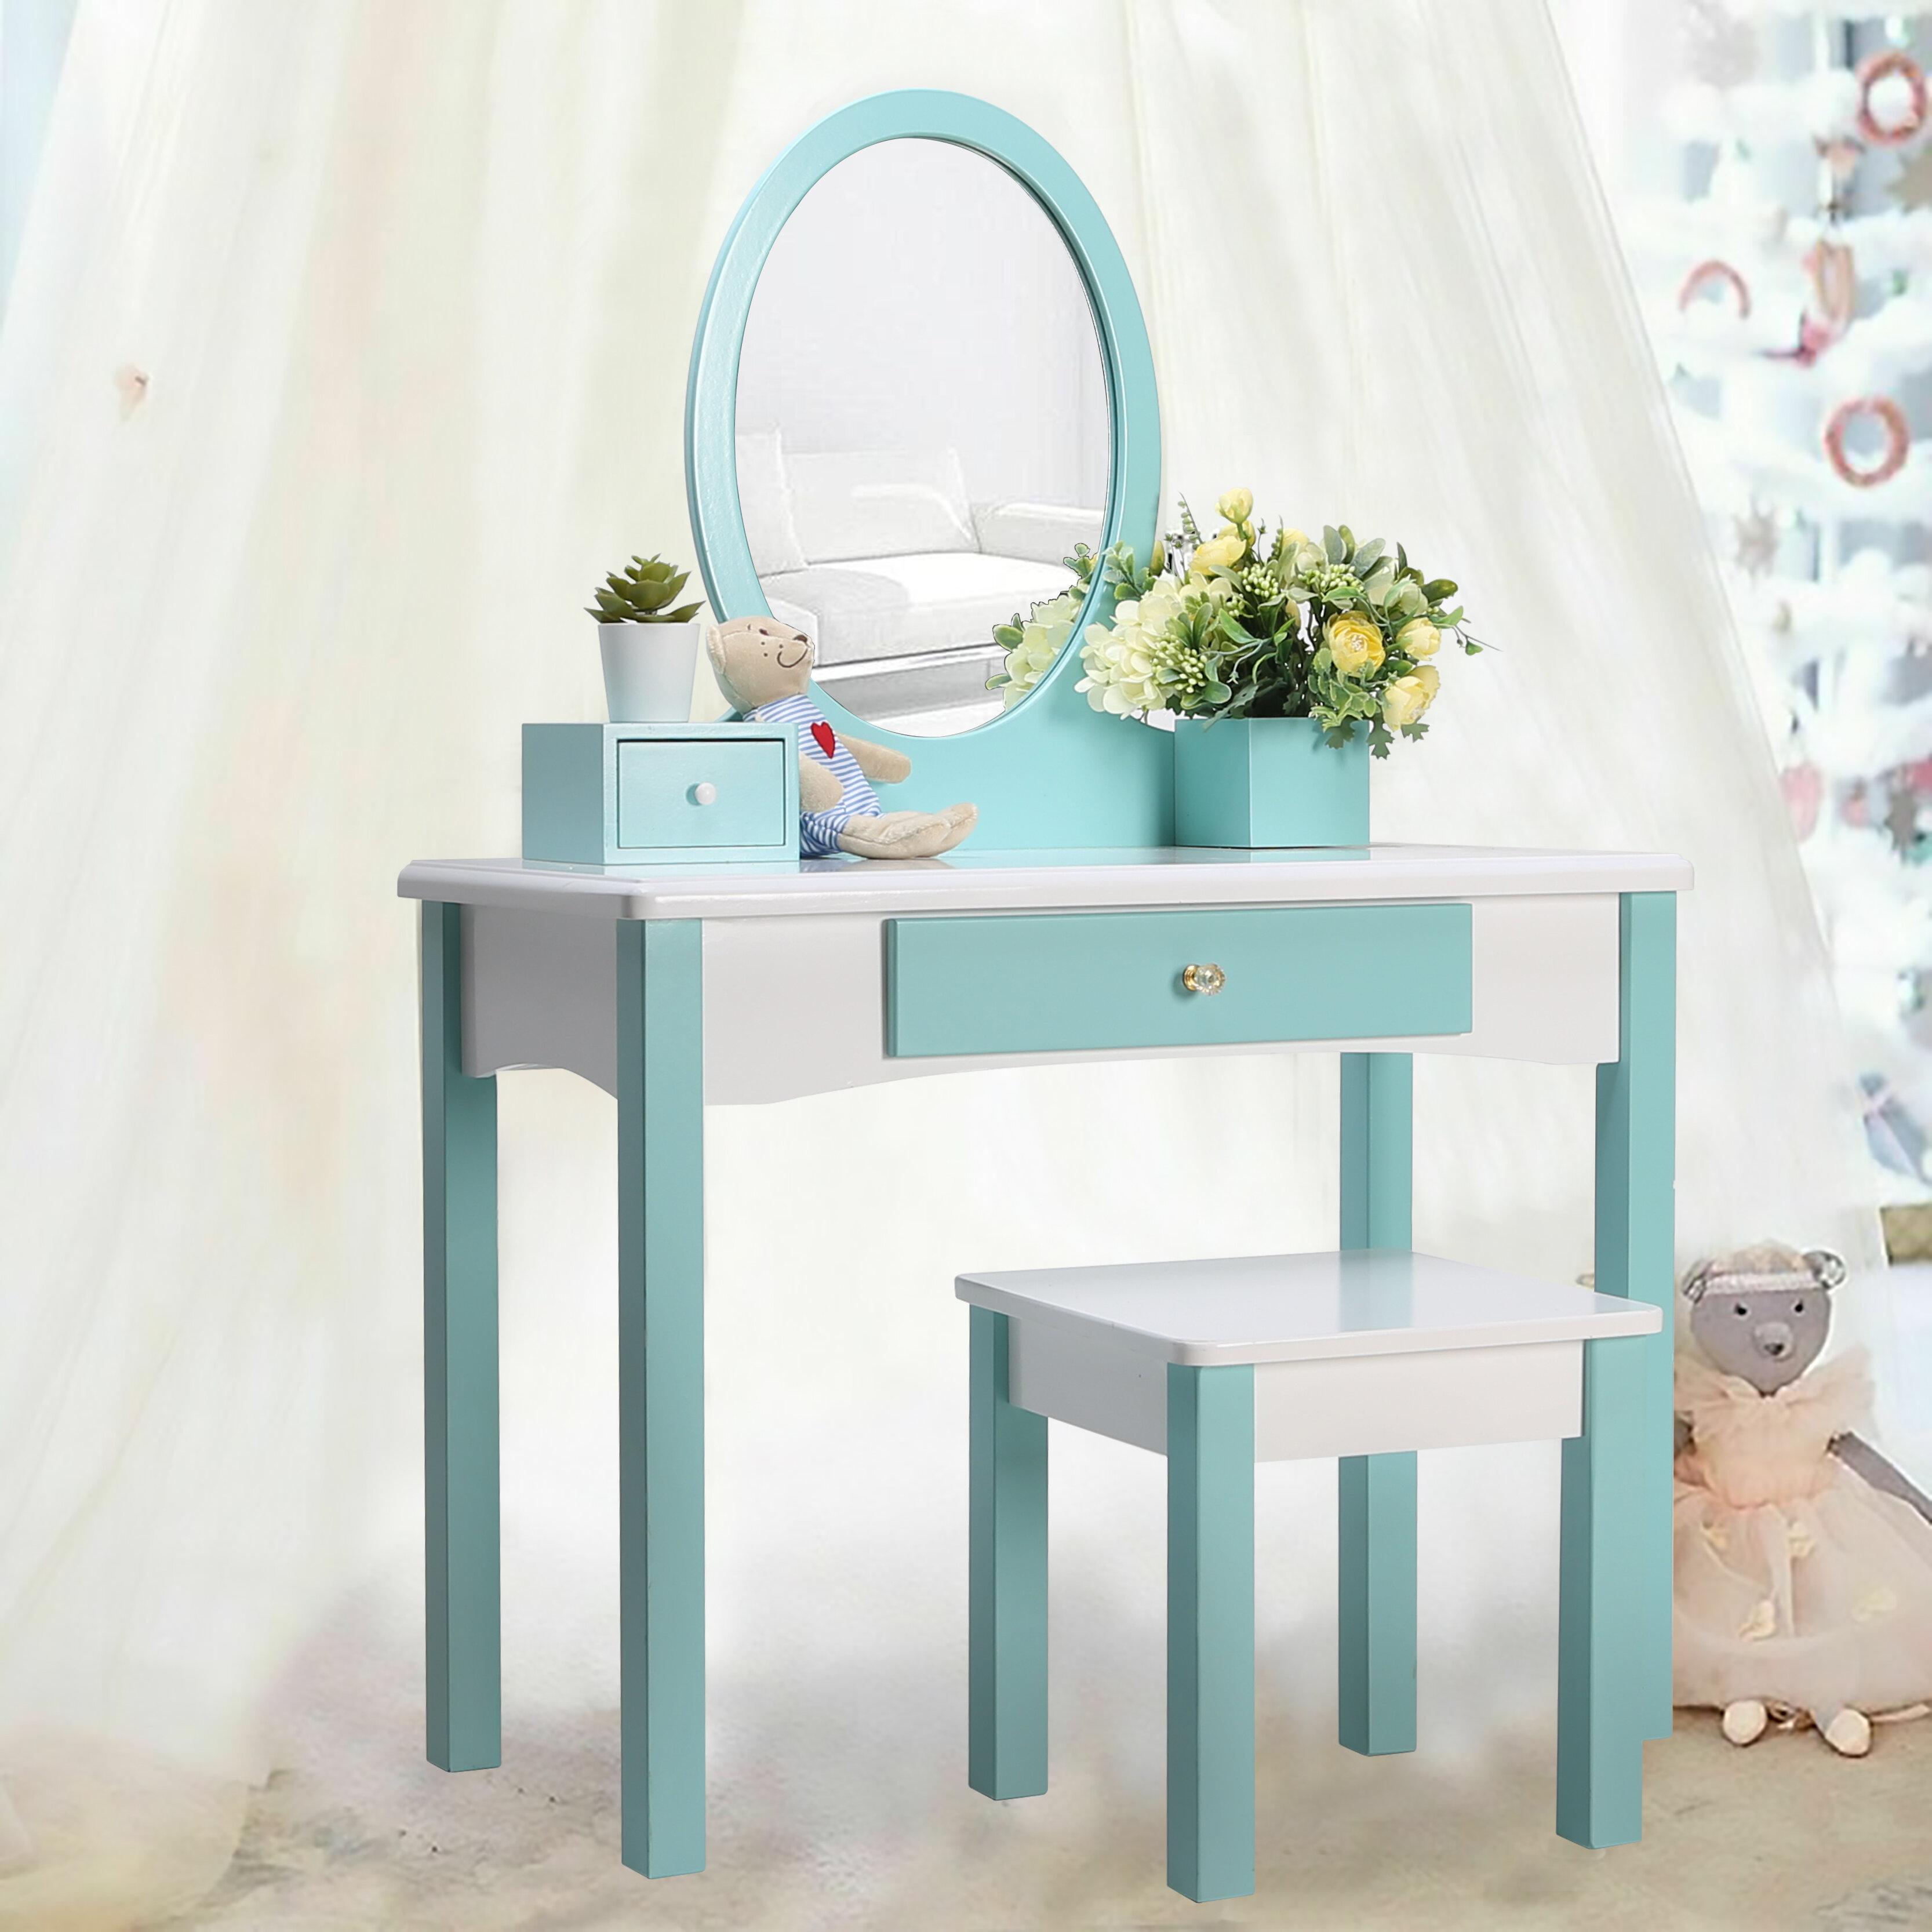 Kids Dressing Table ,Little Princess Rapunzel Girls, Wooden Dressing Table  Vanity Set With Mirror & Stool,Oval Mirror Set, Vanity Table,Playroom